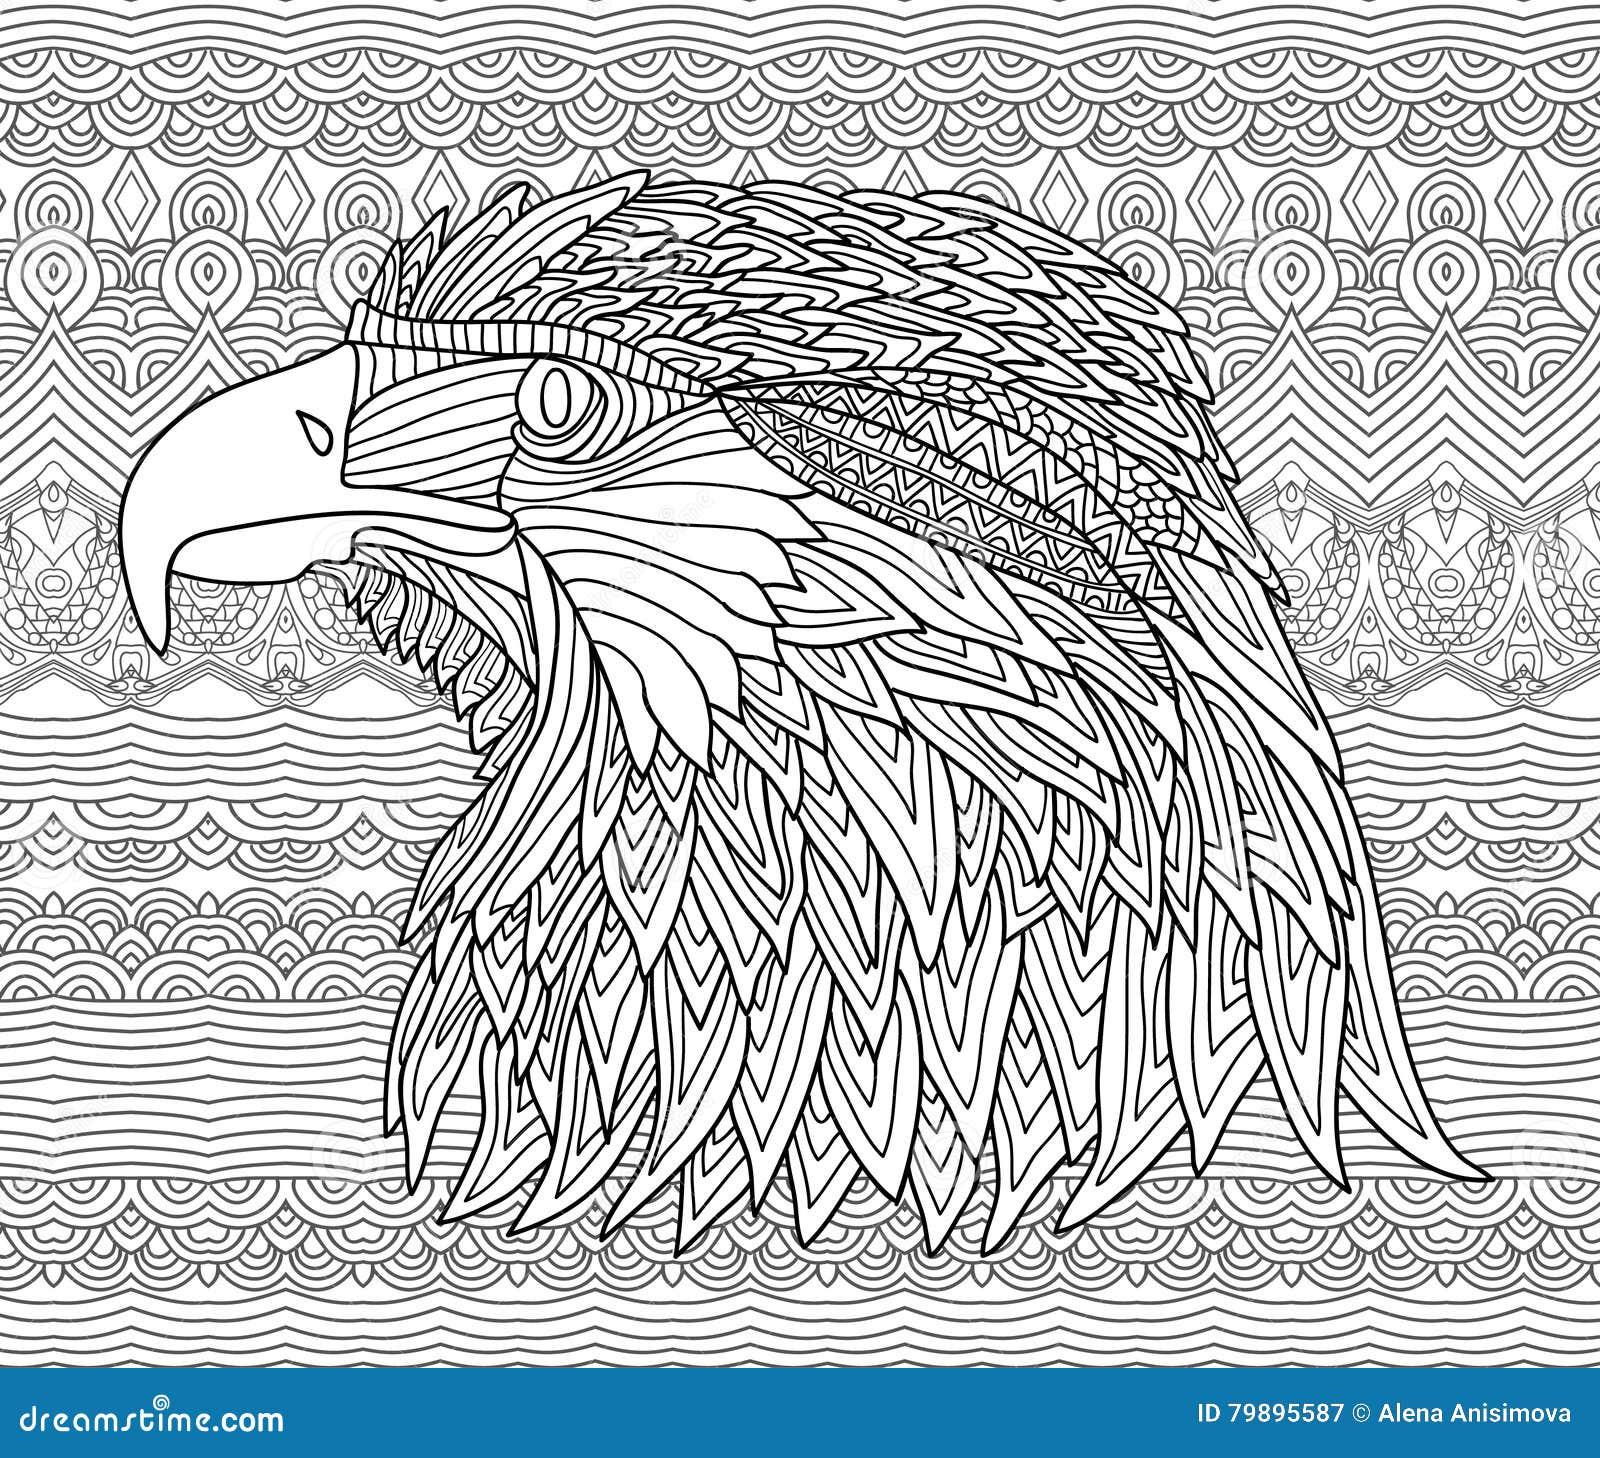 Vector Illustration Decorative Bird On White Background